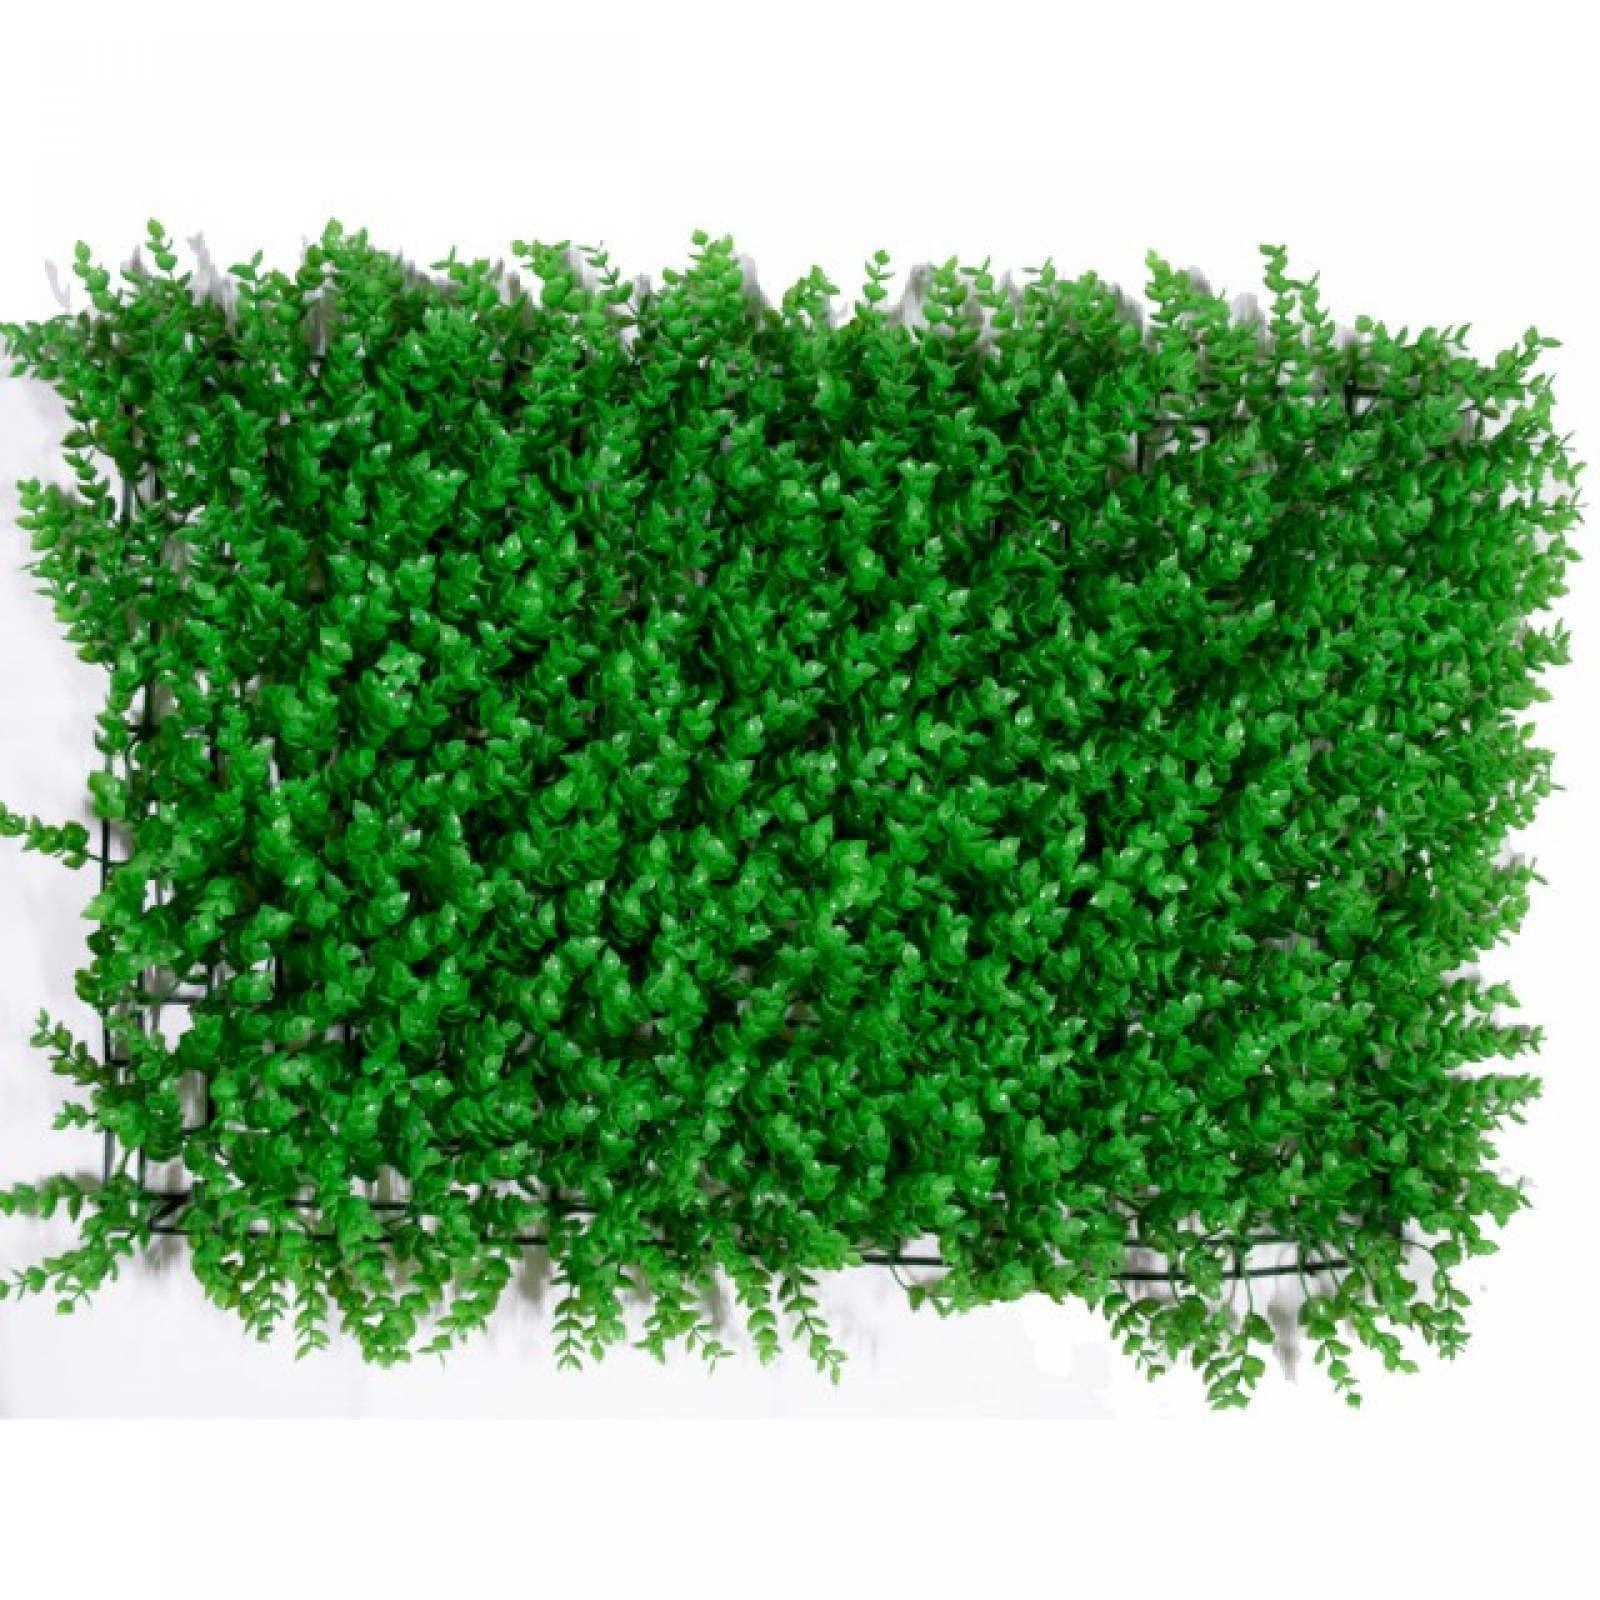 Follaje artificial 40x60 cm muro verde modelo tropical